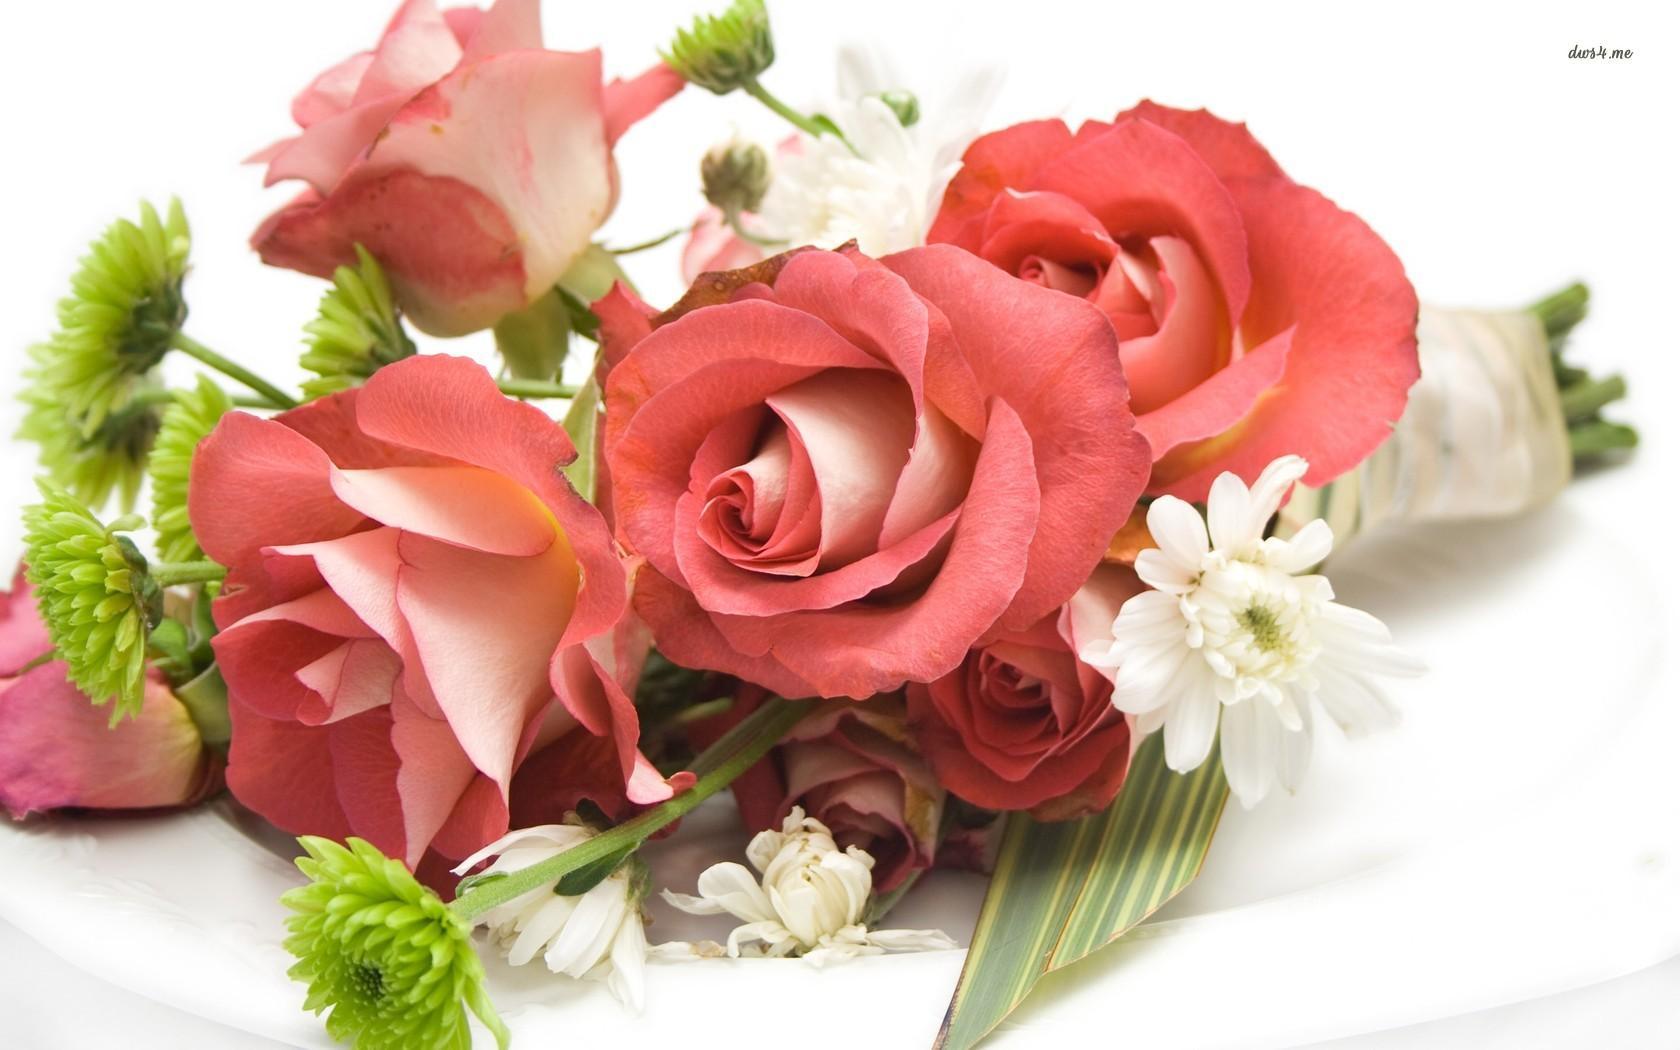 Flowersukdelivery